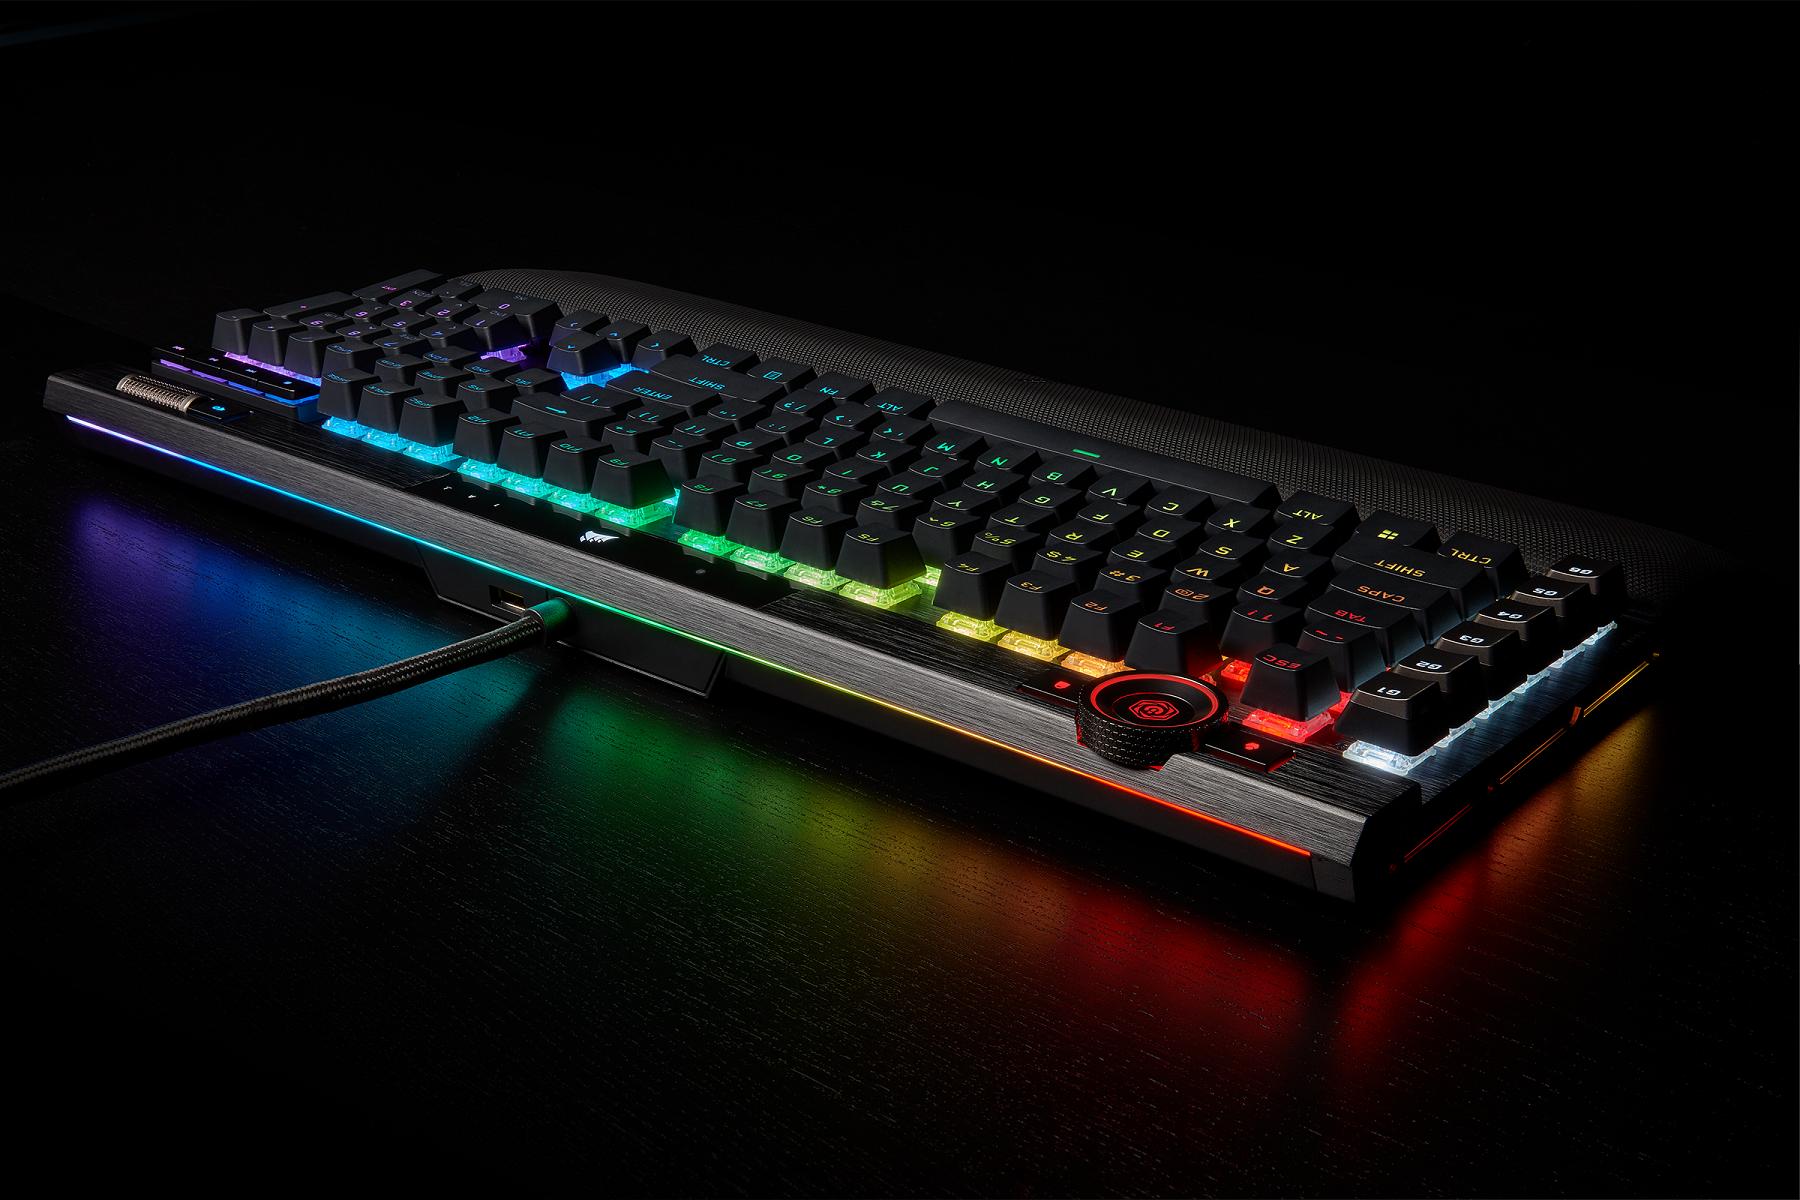 Corsair's gaming keyboards have a new king: the Corsair K100